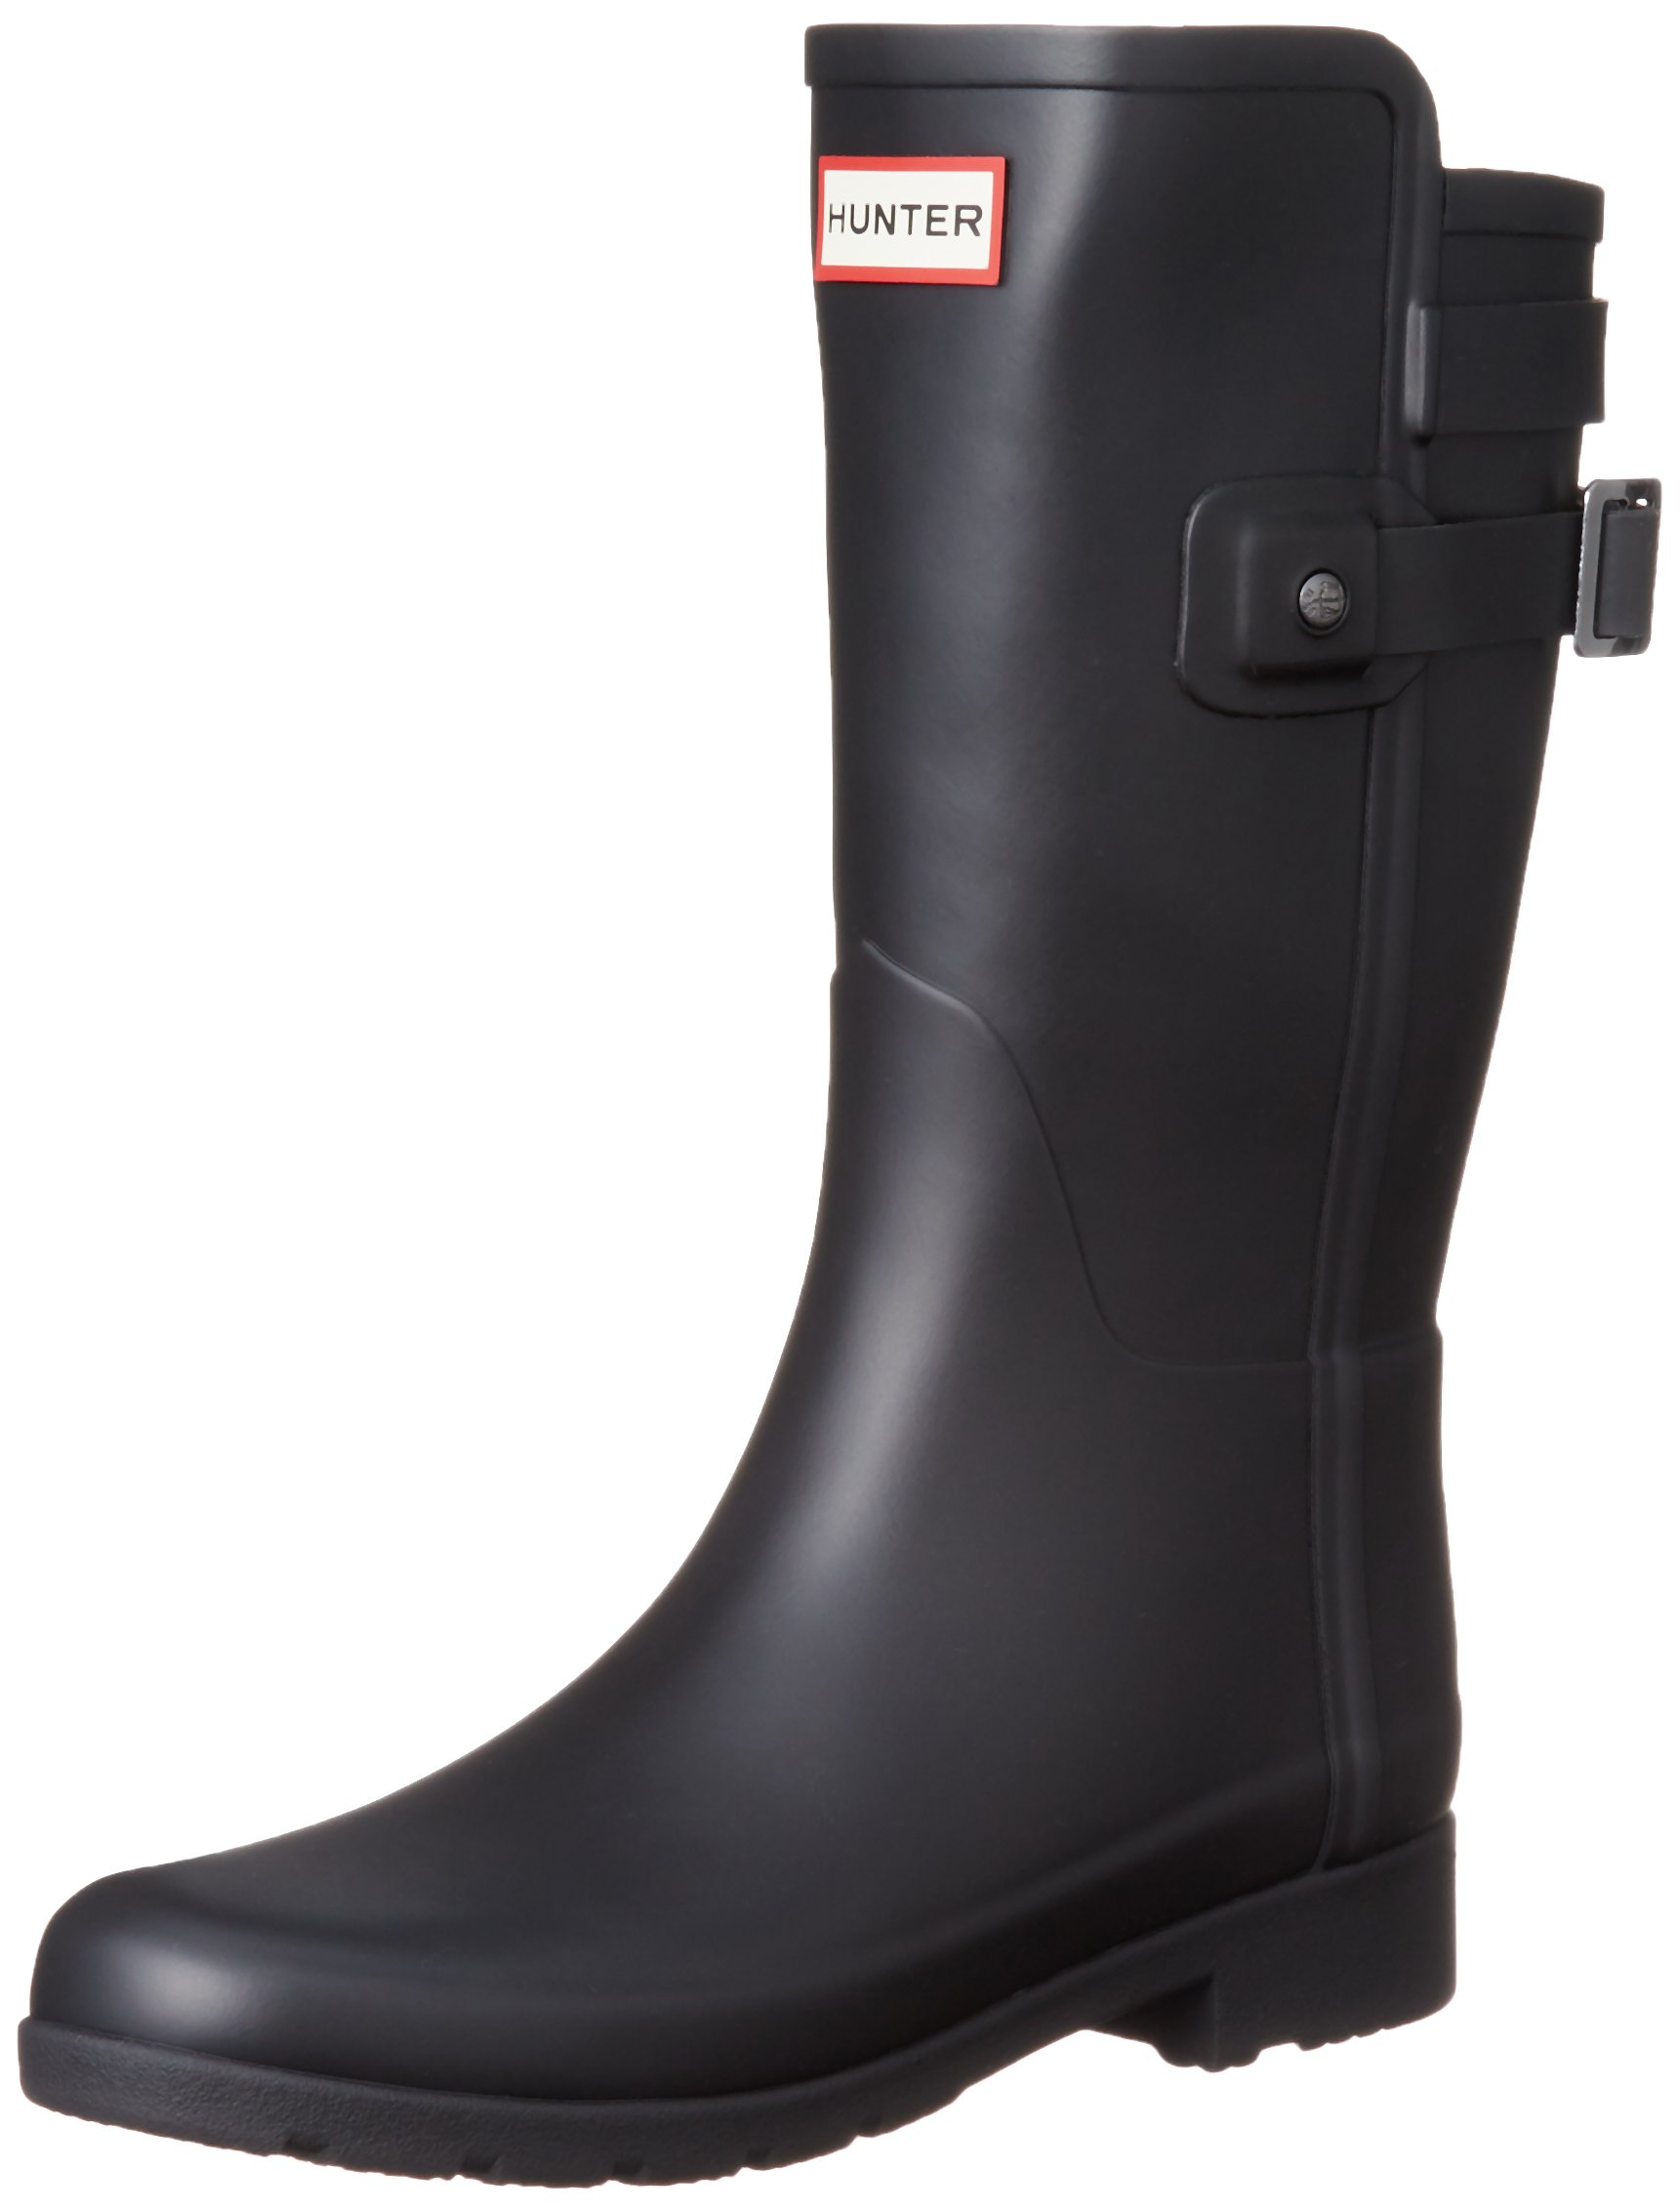 Hunter Women's Original Short Refined Back Strap Rain Boots Black 5 M US